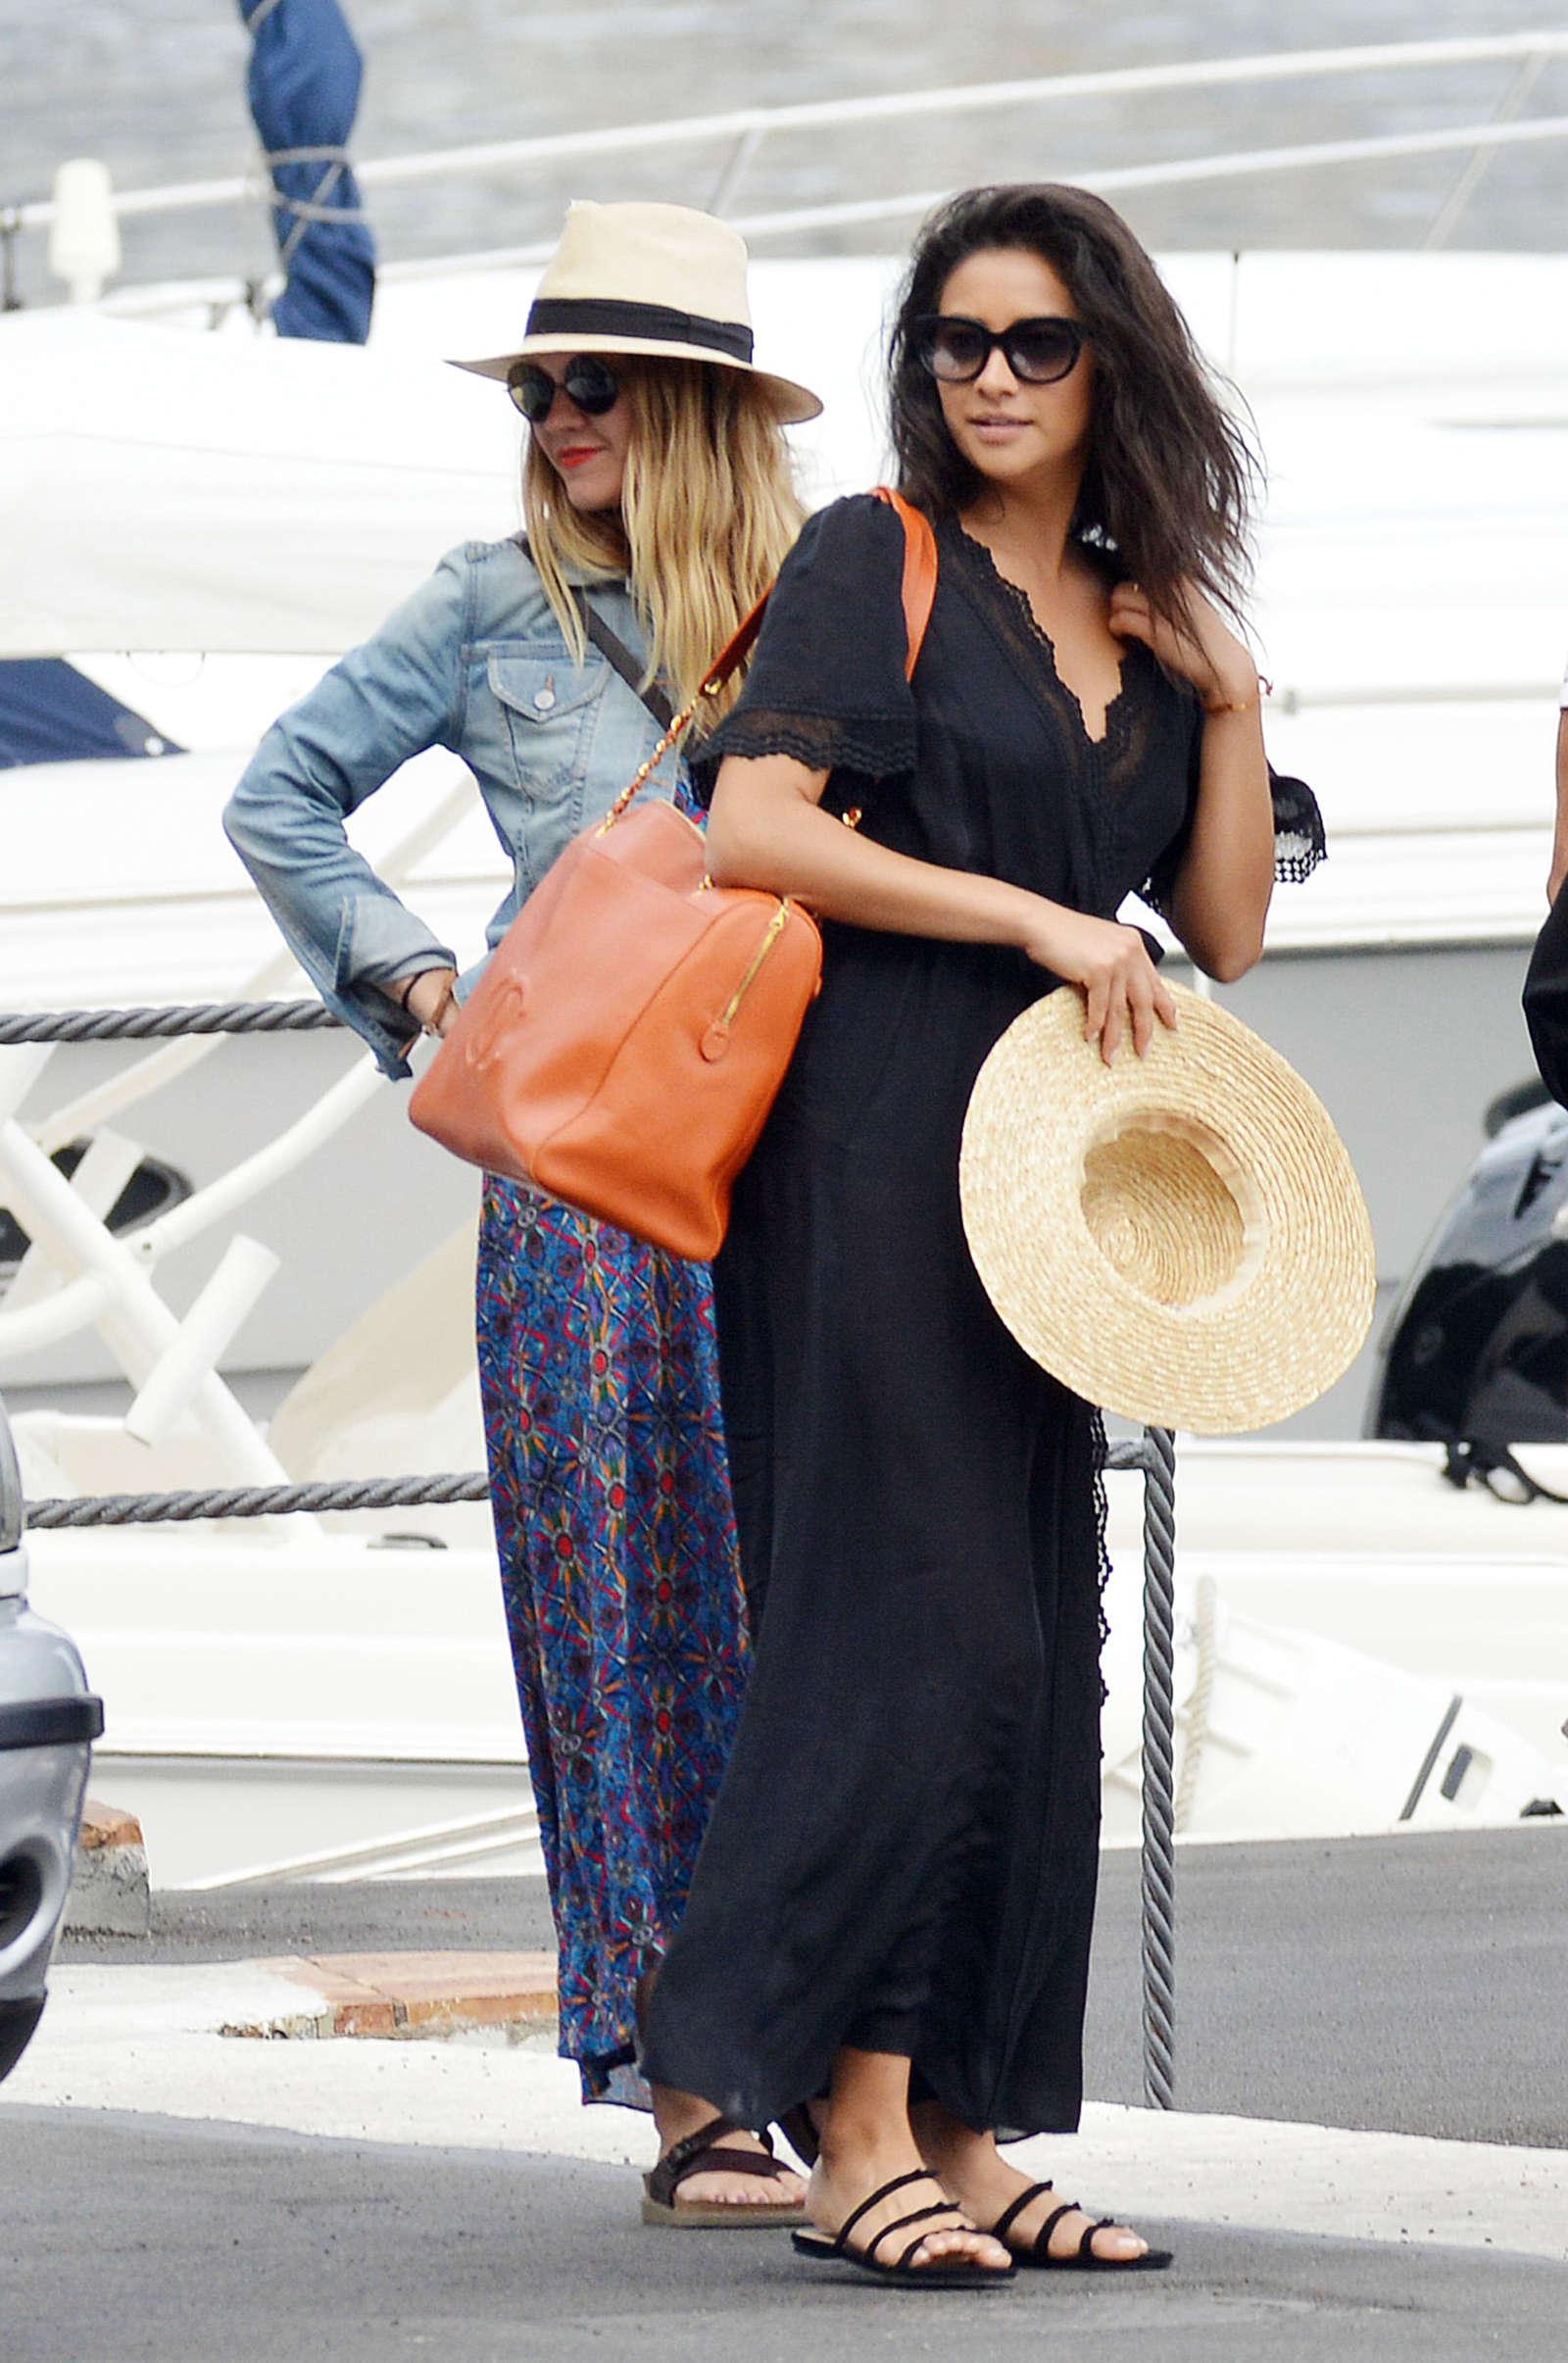 Ashley Benson 2016 : Ashley Benson, Shay Mitchell and Troian Bellisario on a boat in Capri -15